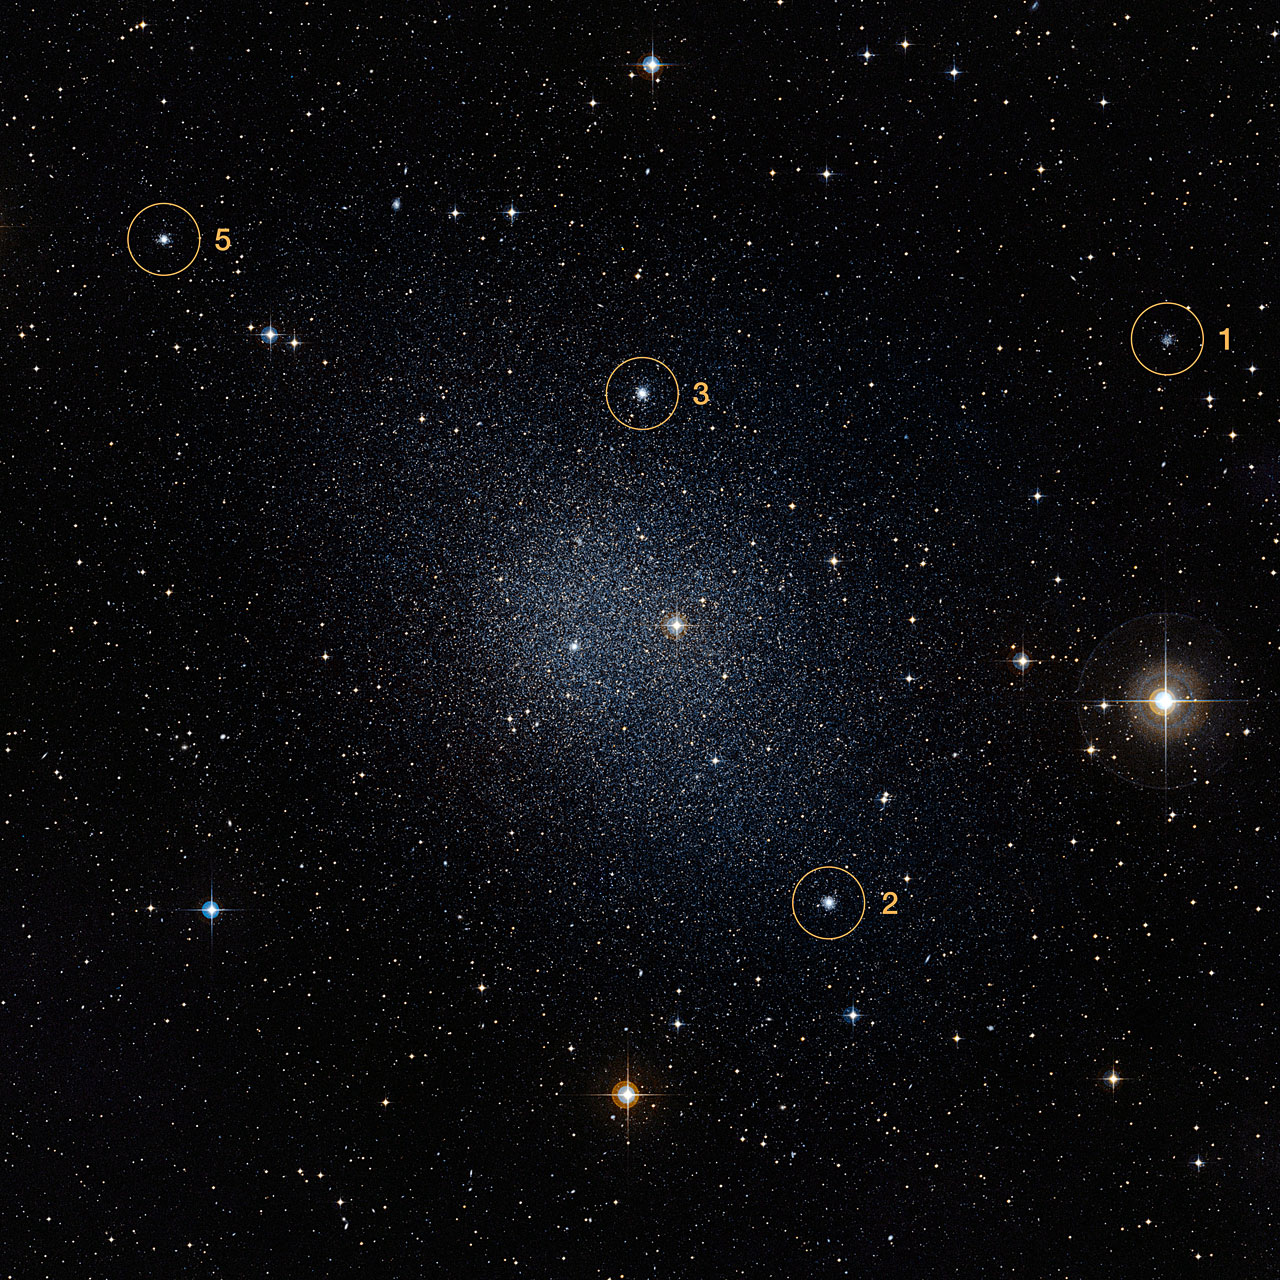 milky way galaxy cluster - photo #44